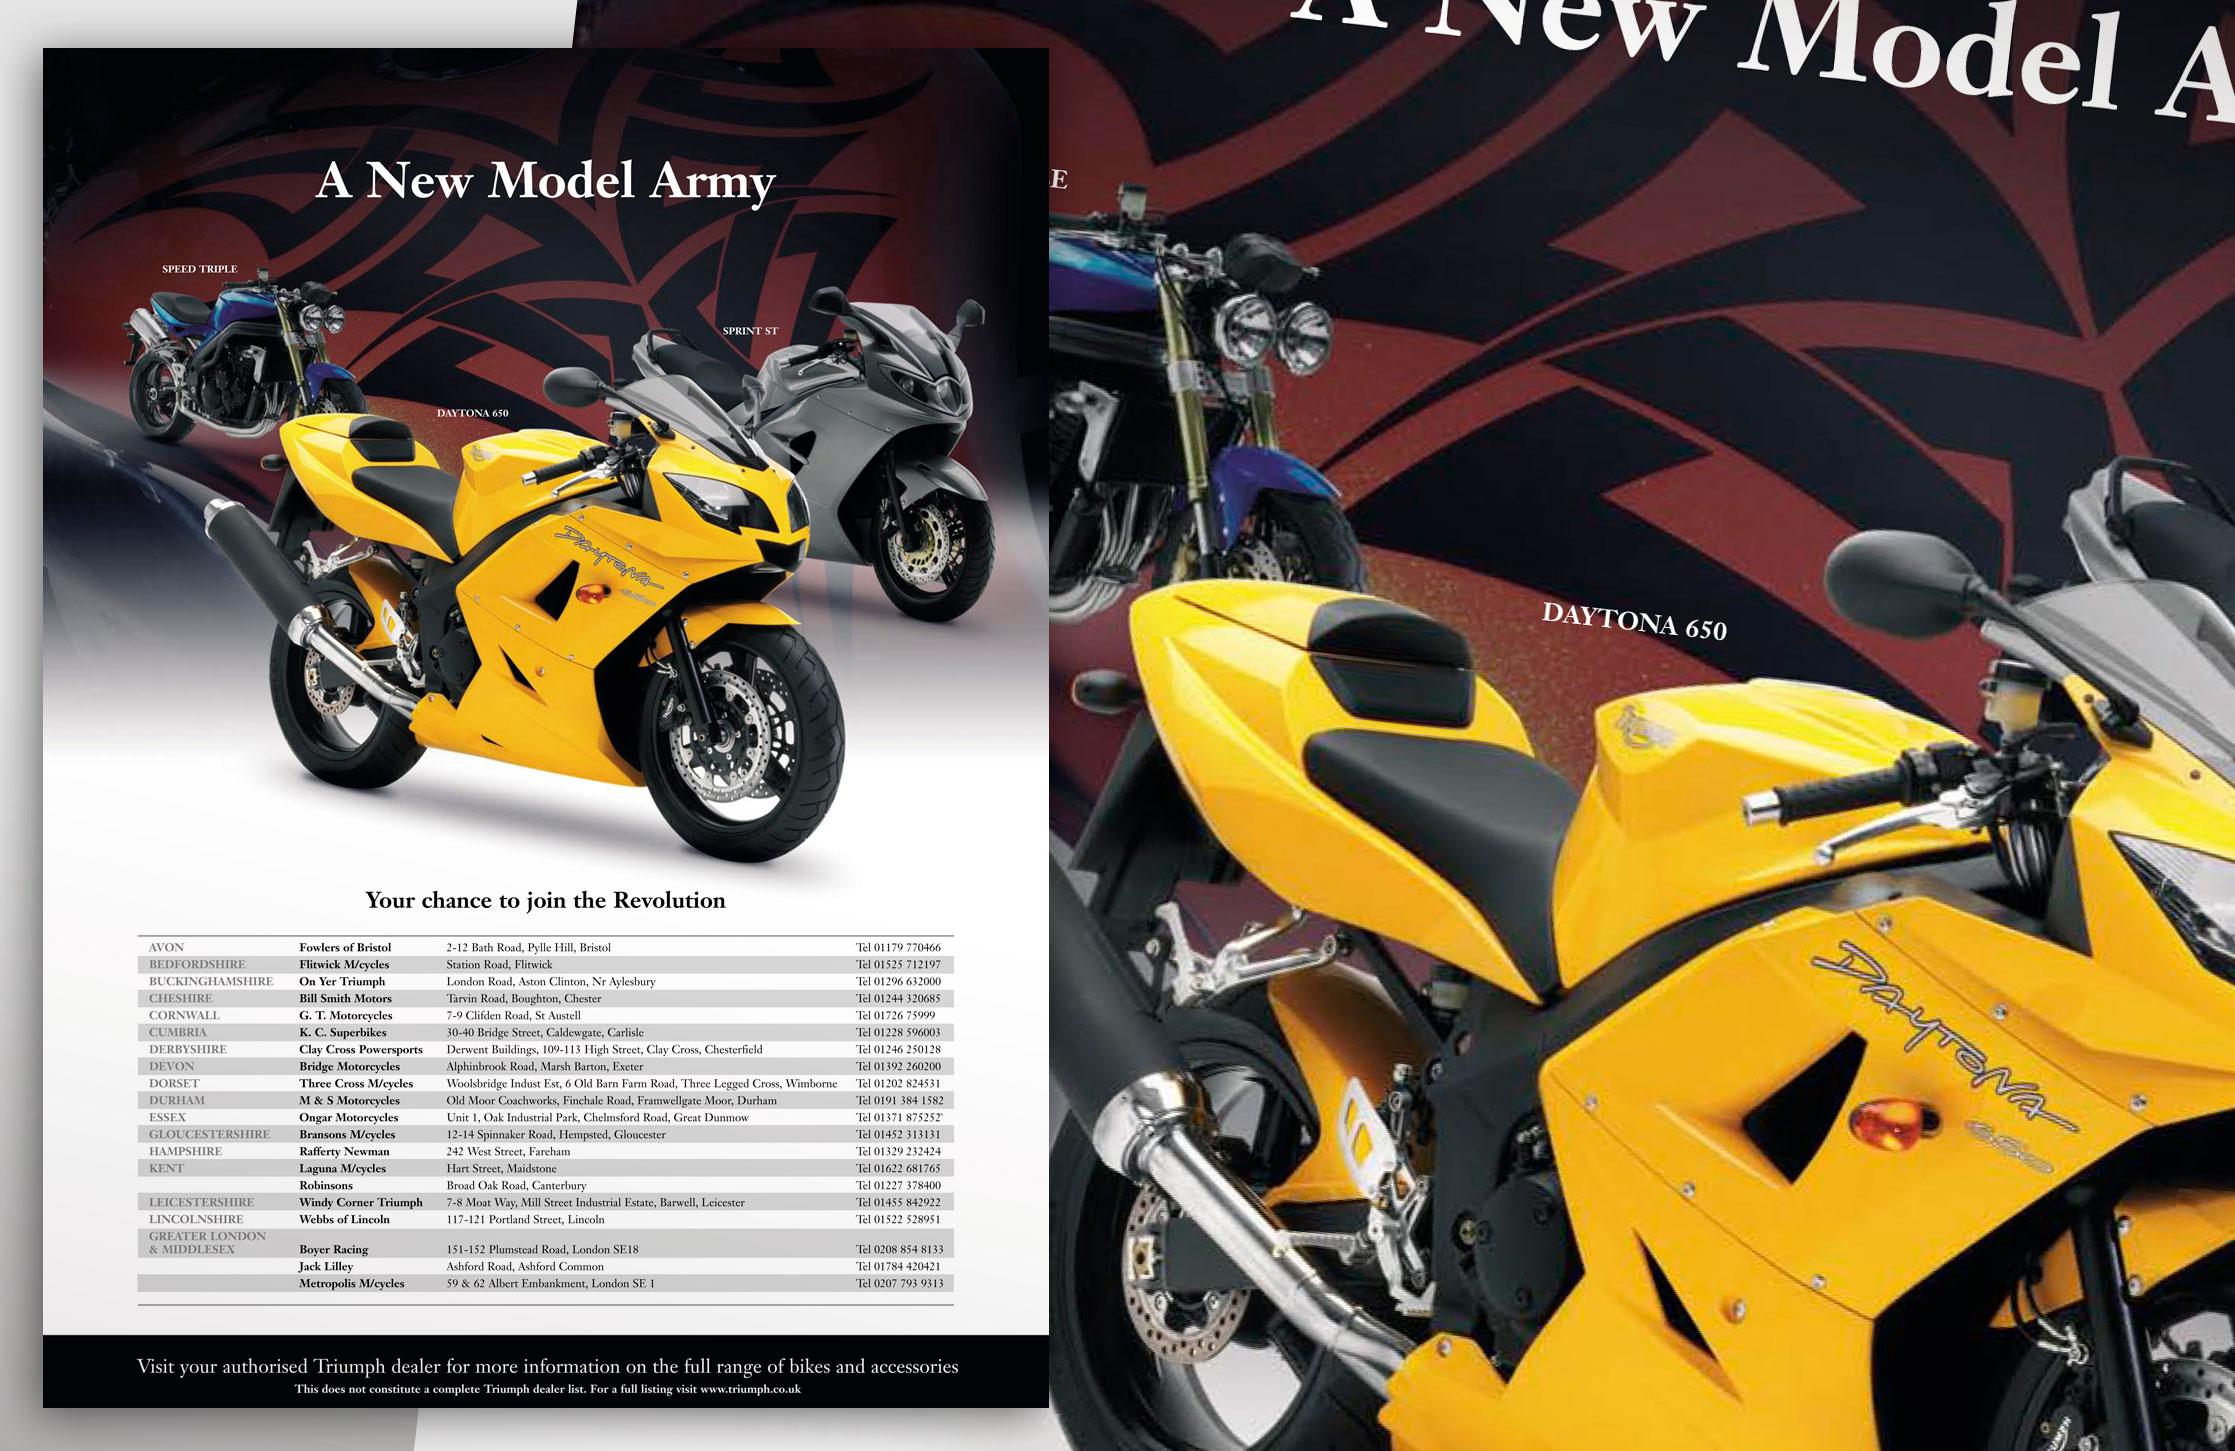 Triumph Advert for MCN